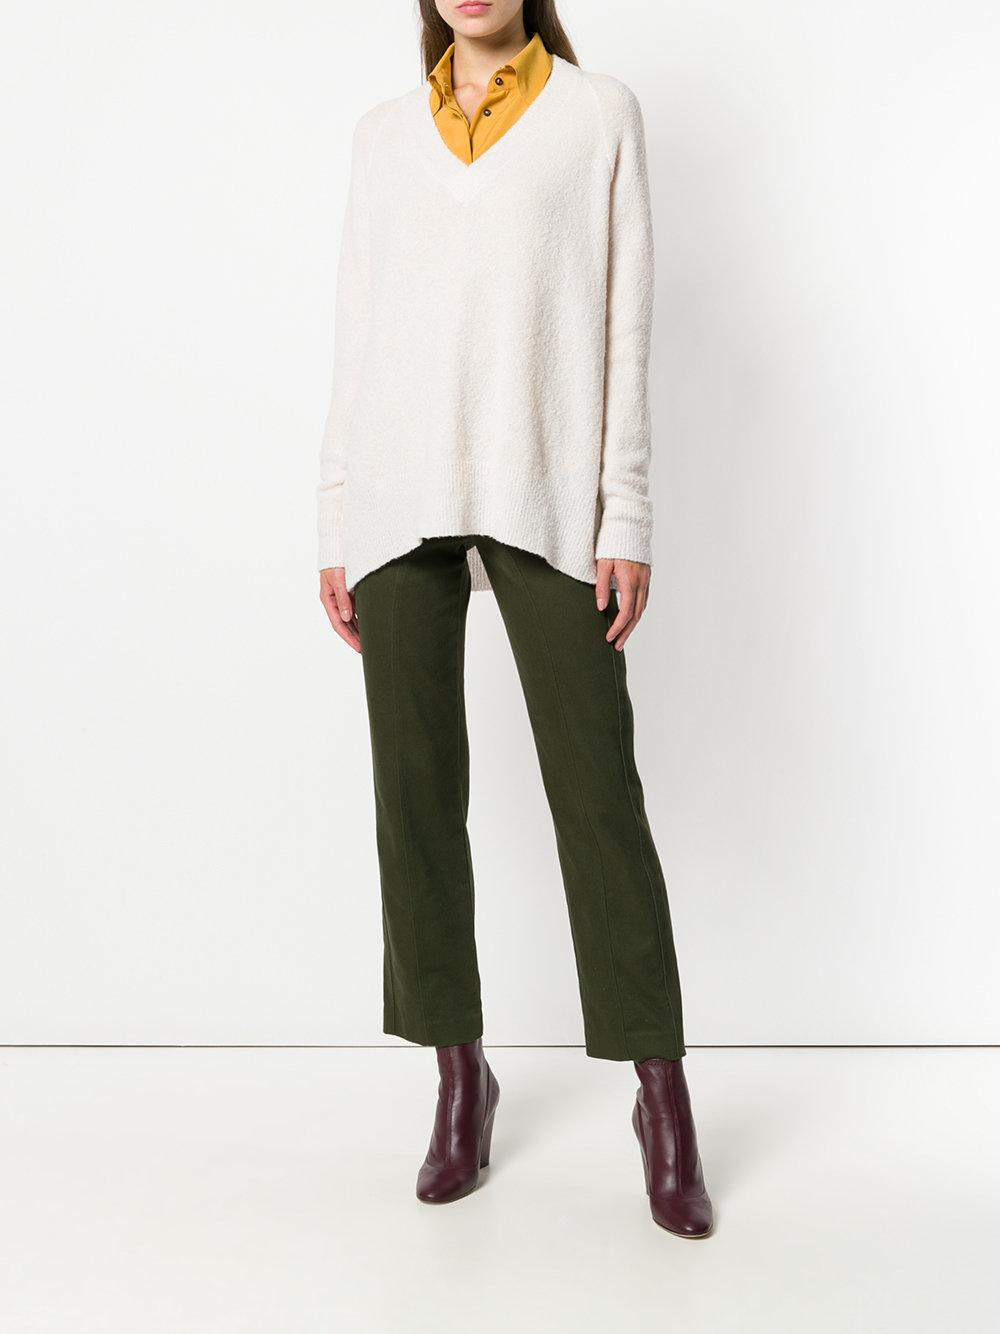 Christian Wijnants Wool Karwa Sweater in White